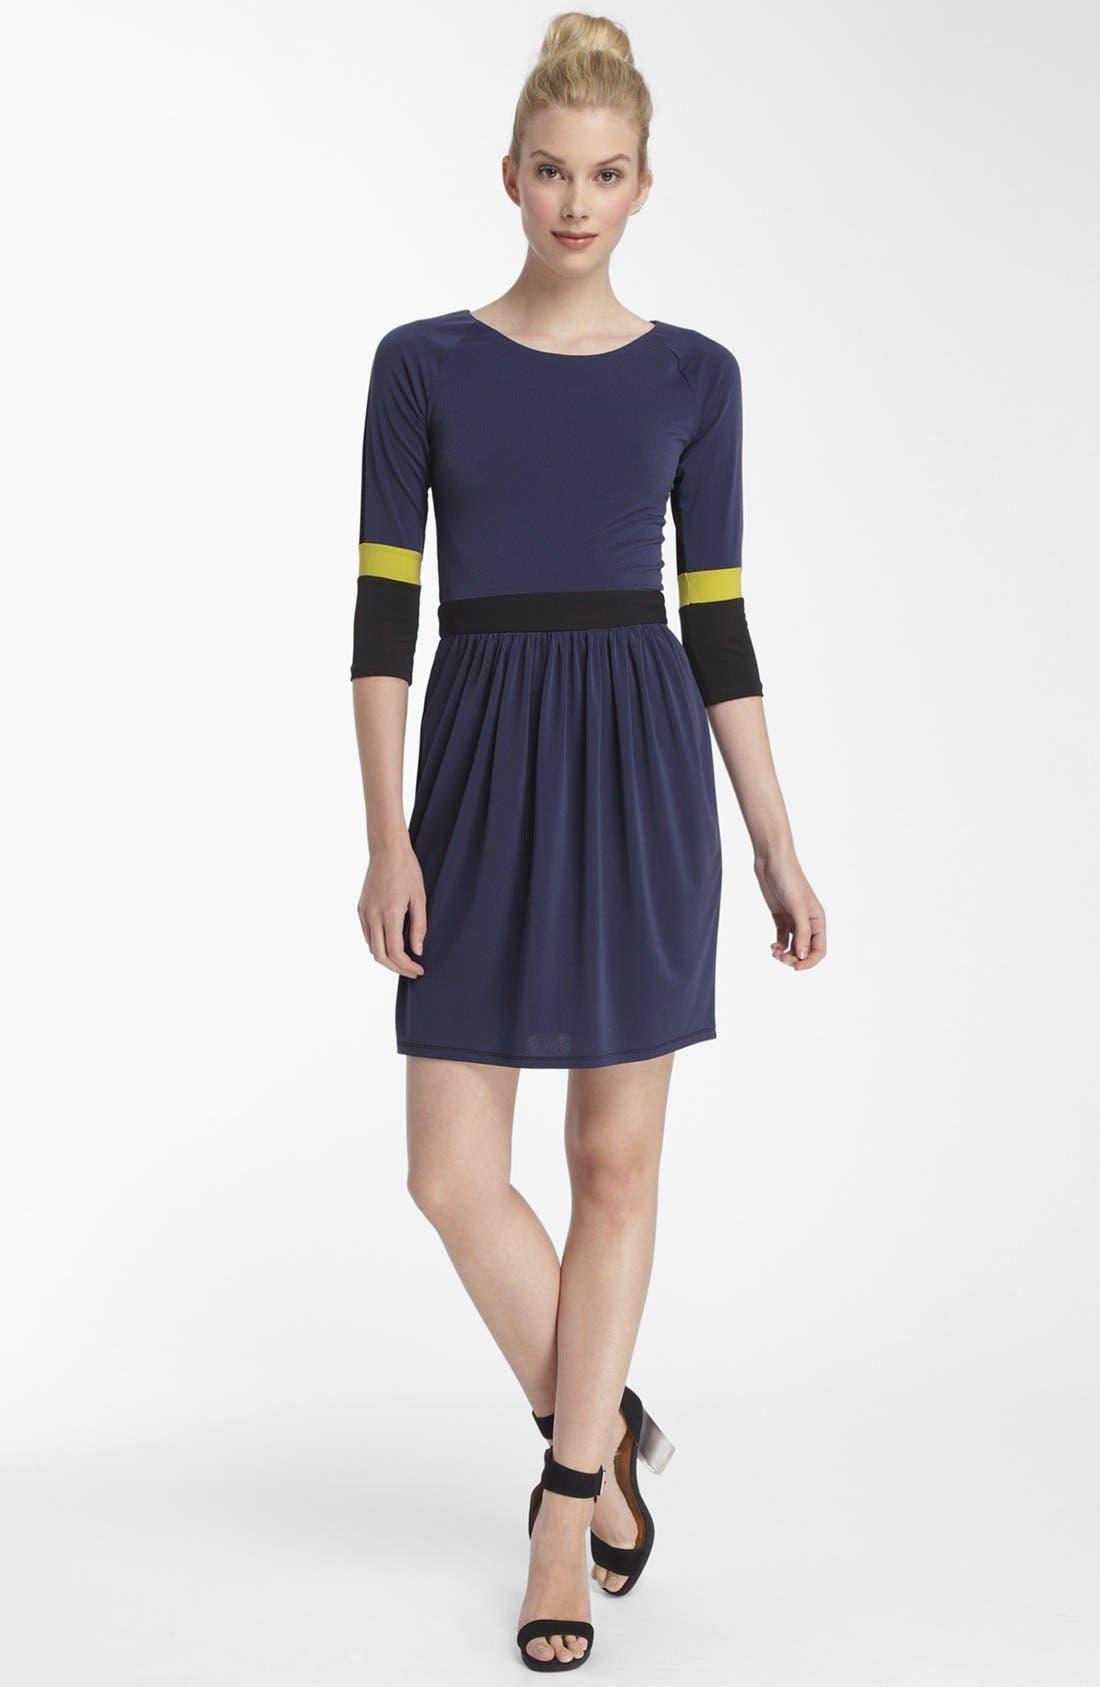 Alternate Image 1 Selected - Catherine Catherine Malandrino 'Nala' Knit Dress